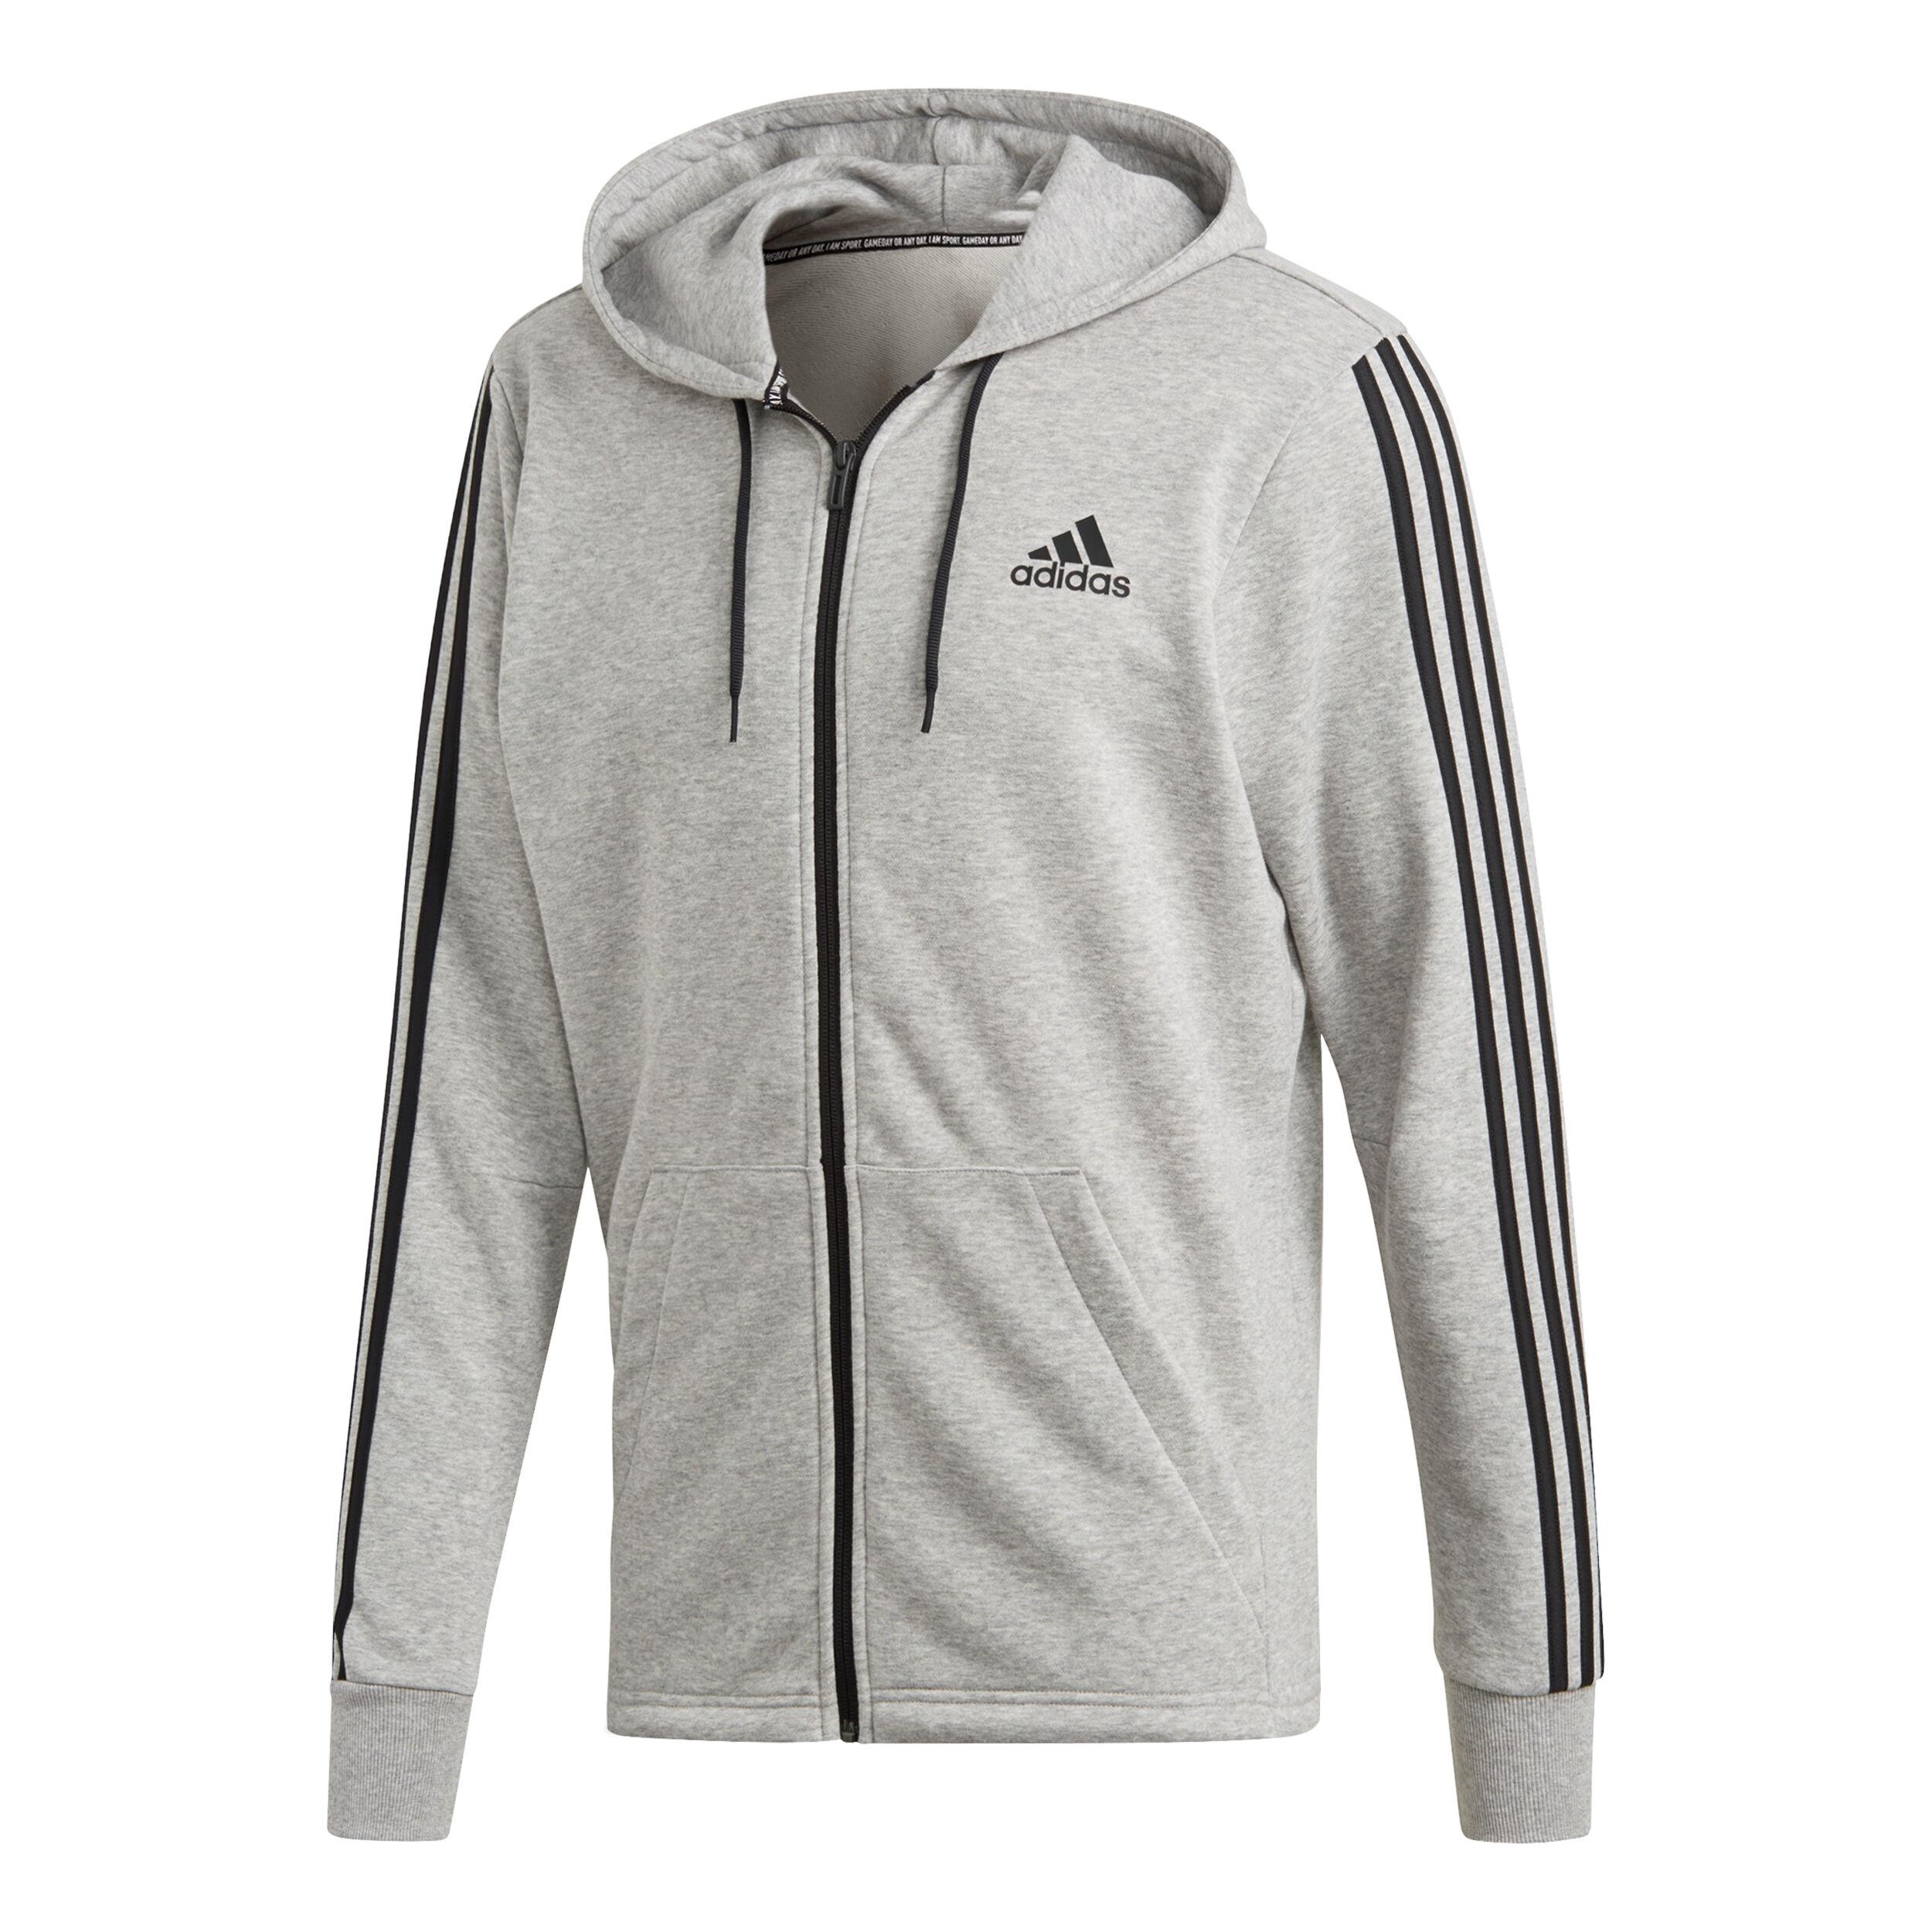 adidas Must Have 3 Stripes French Terry Full Zip Sweatjacke Herren Grau, Schwarz